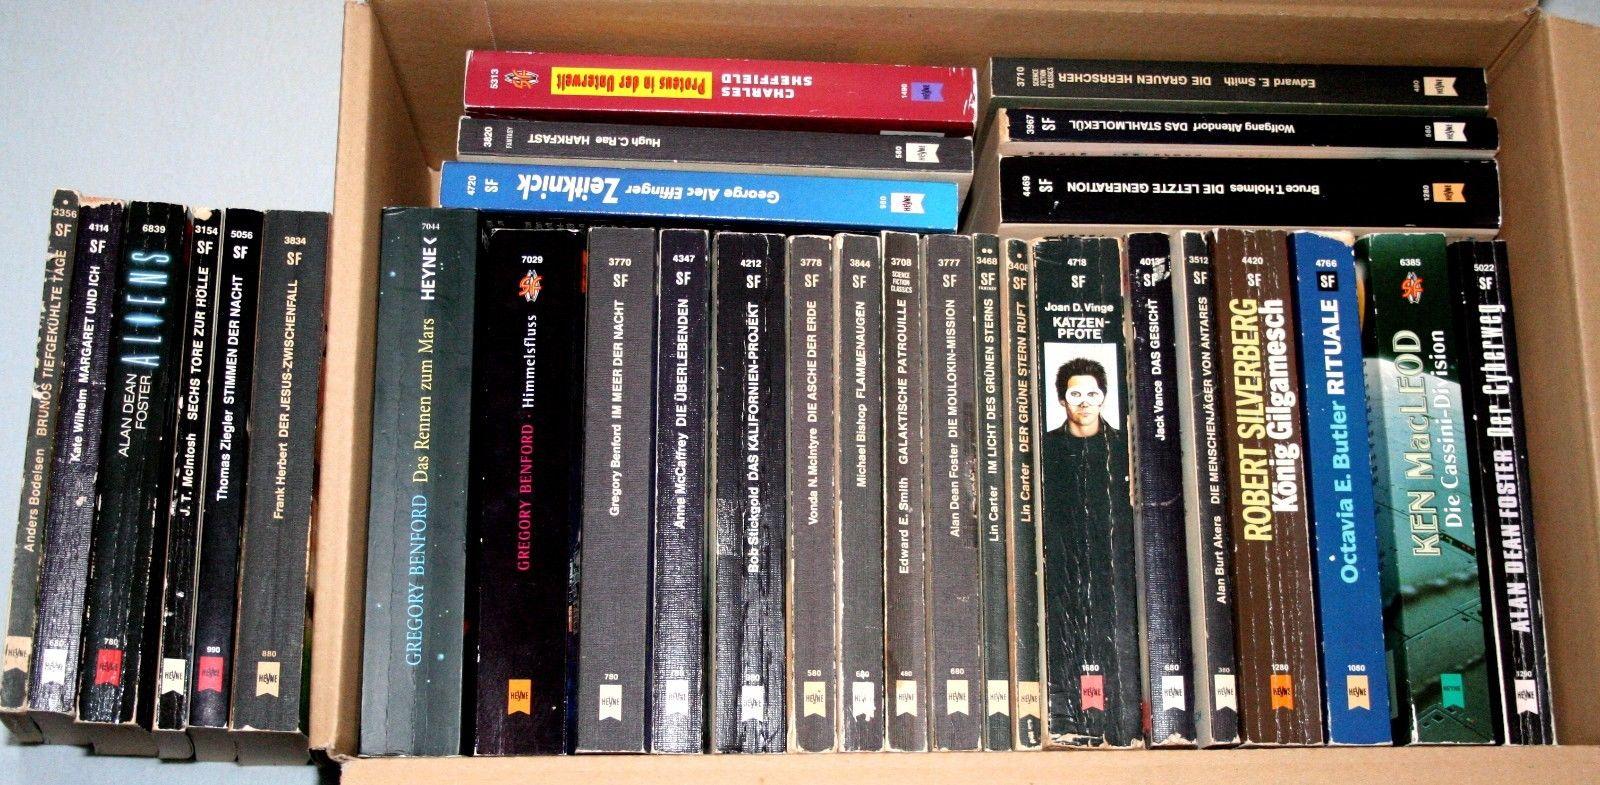 30 Heyne-Science Fiction Bücher